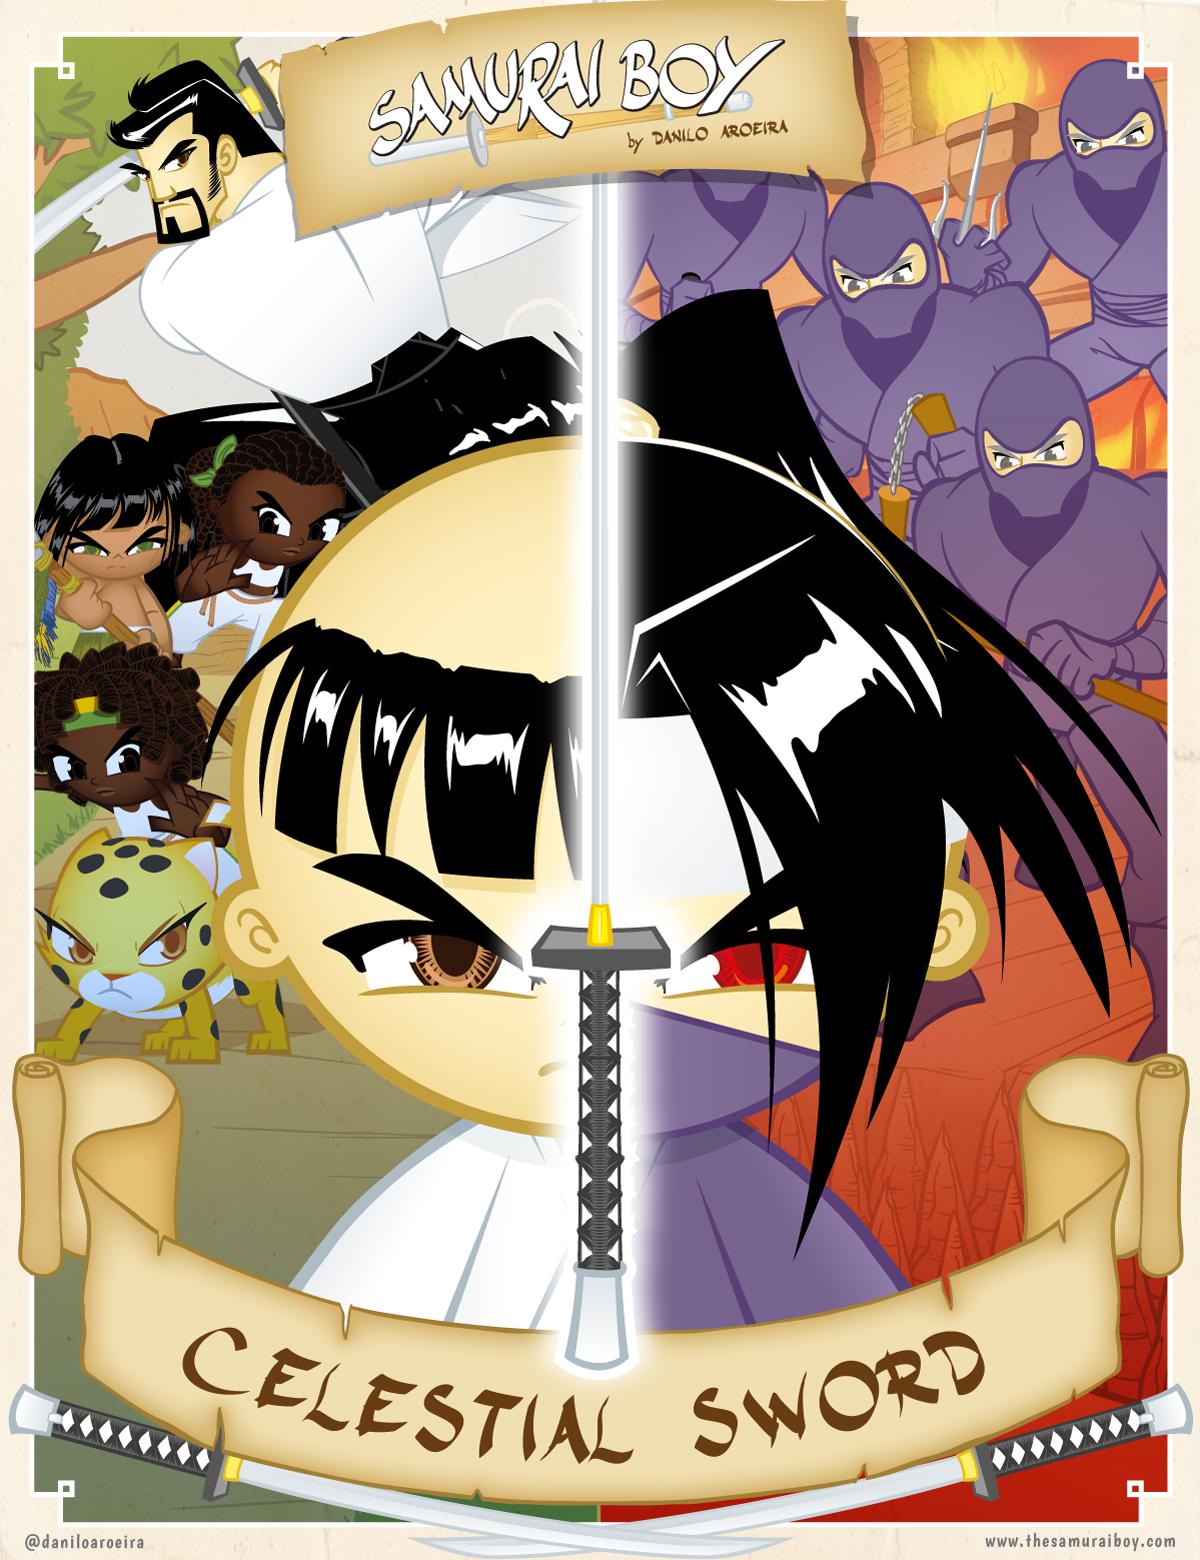 Celestial Sword